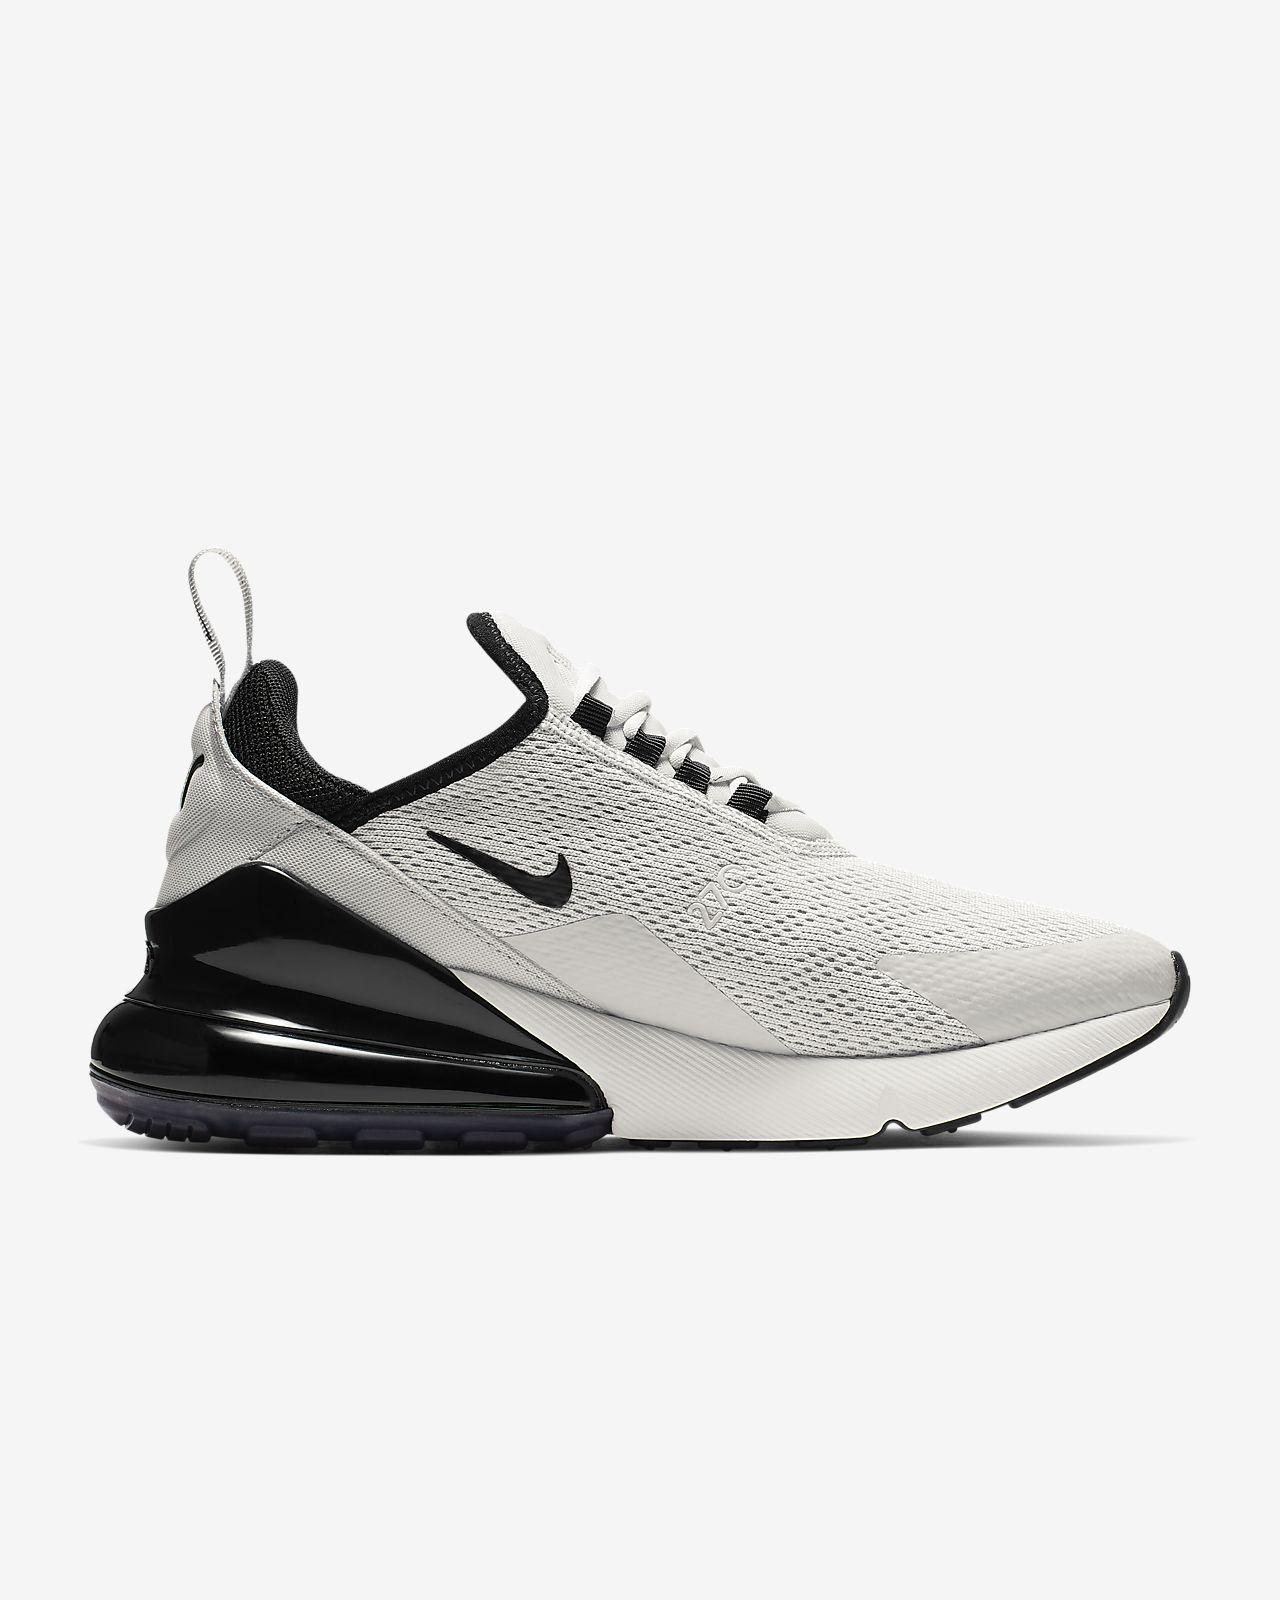 online store e72f1 86fd1 ... Nike Air Max 270 Damenschuh